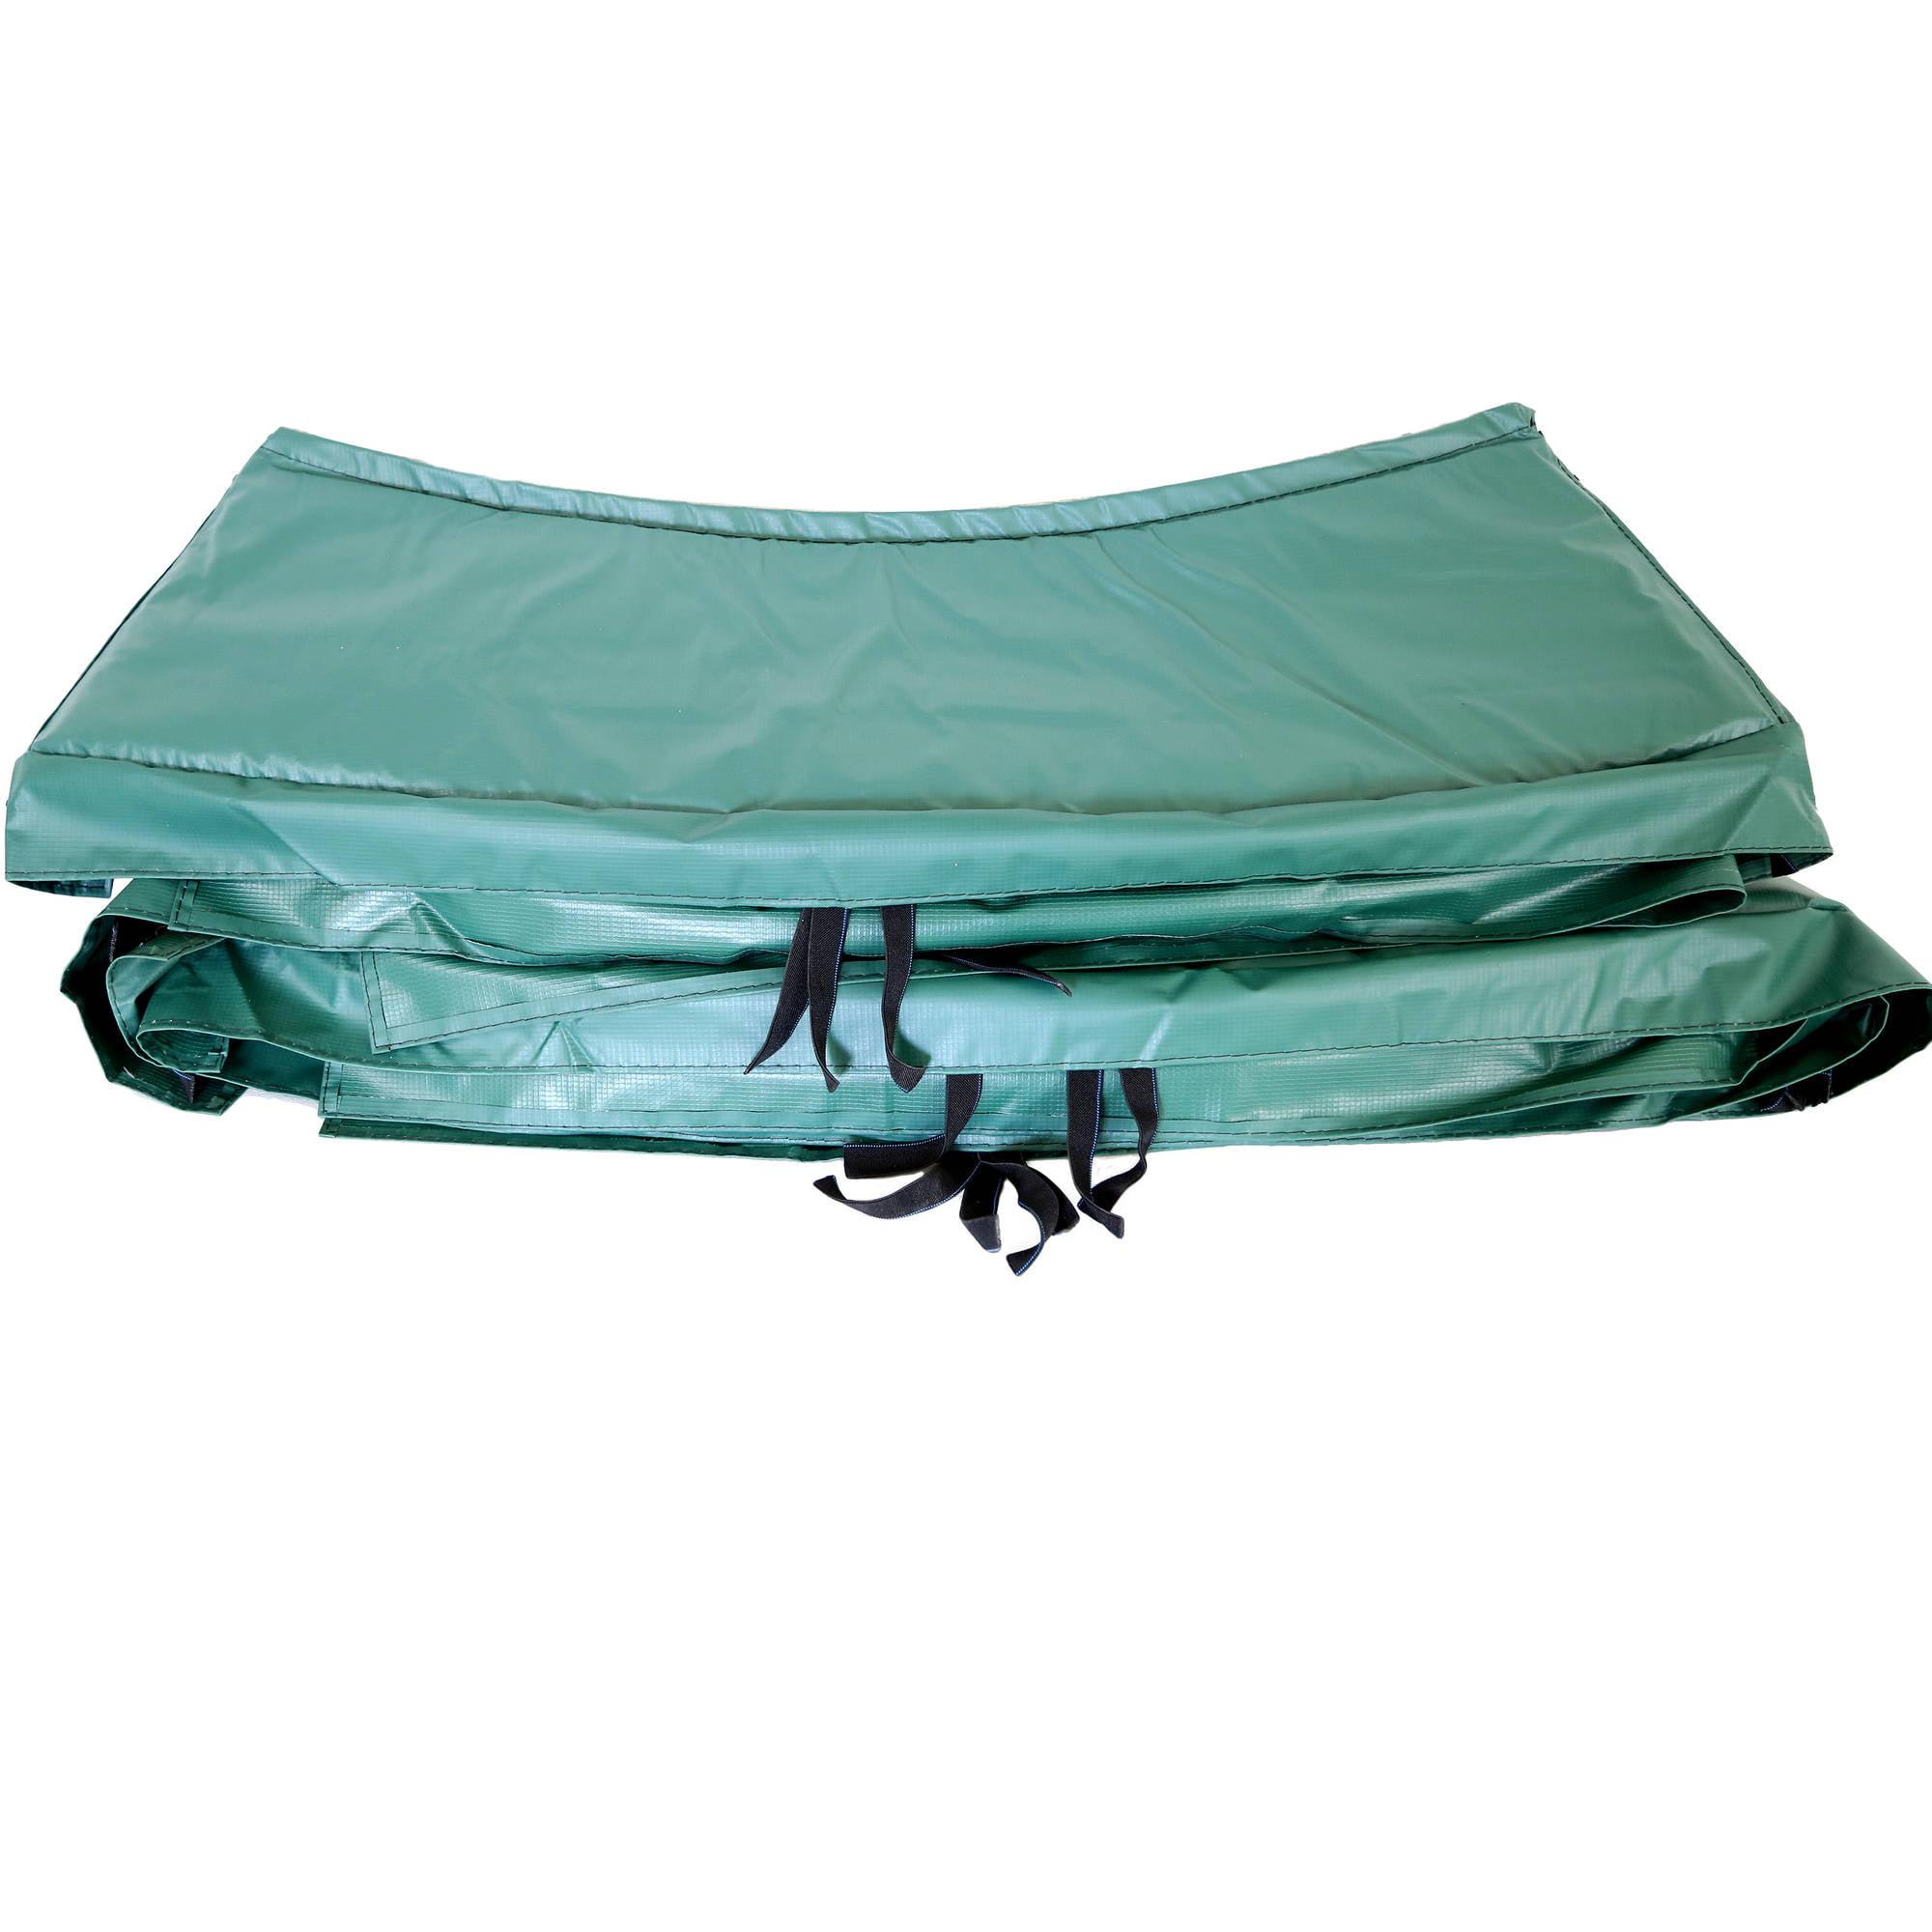 Skywalker Trampolines 12-Foot Round PVC Spring Pad, Green